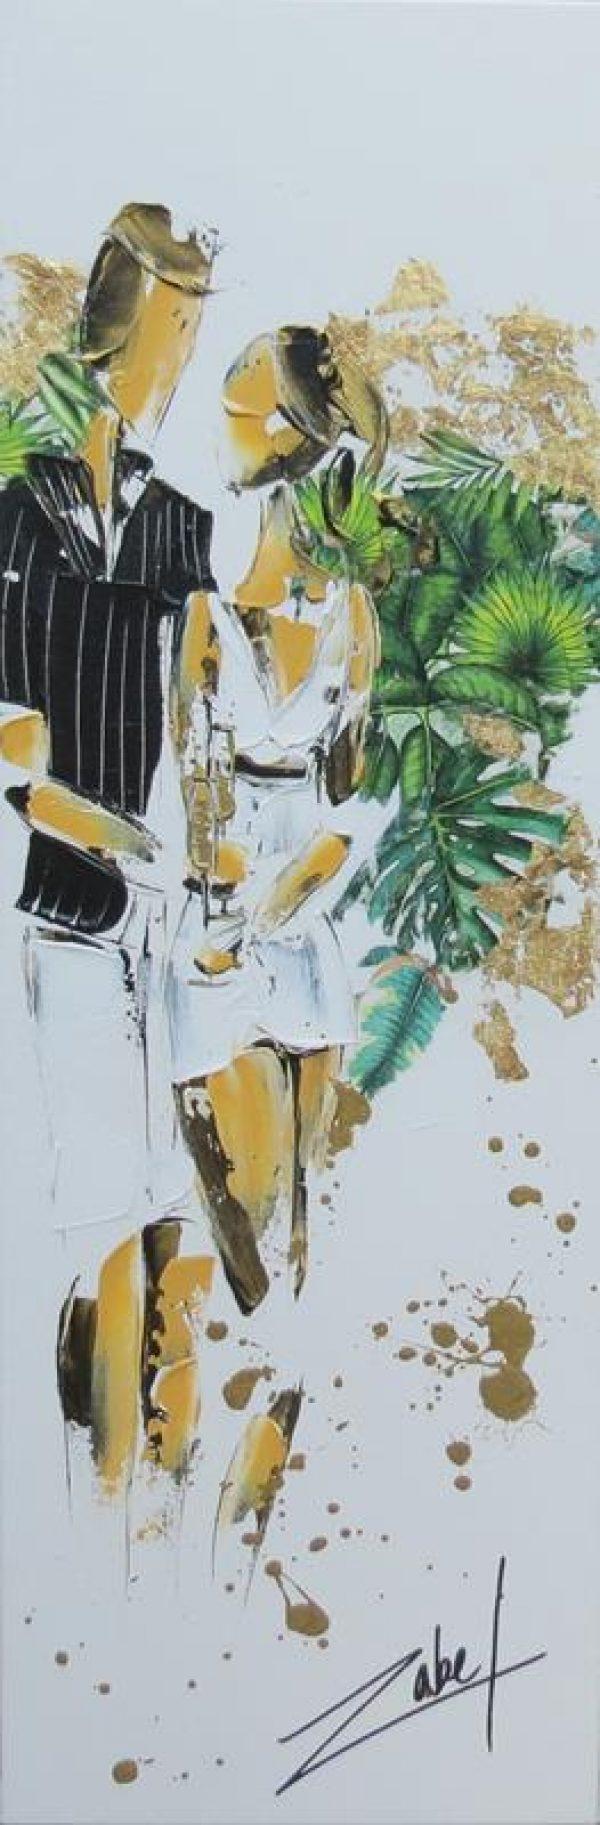 Zabel - tropics and champagne 10x30_web